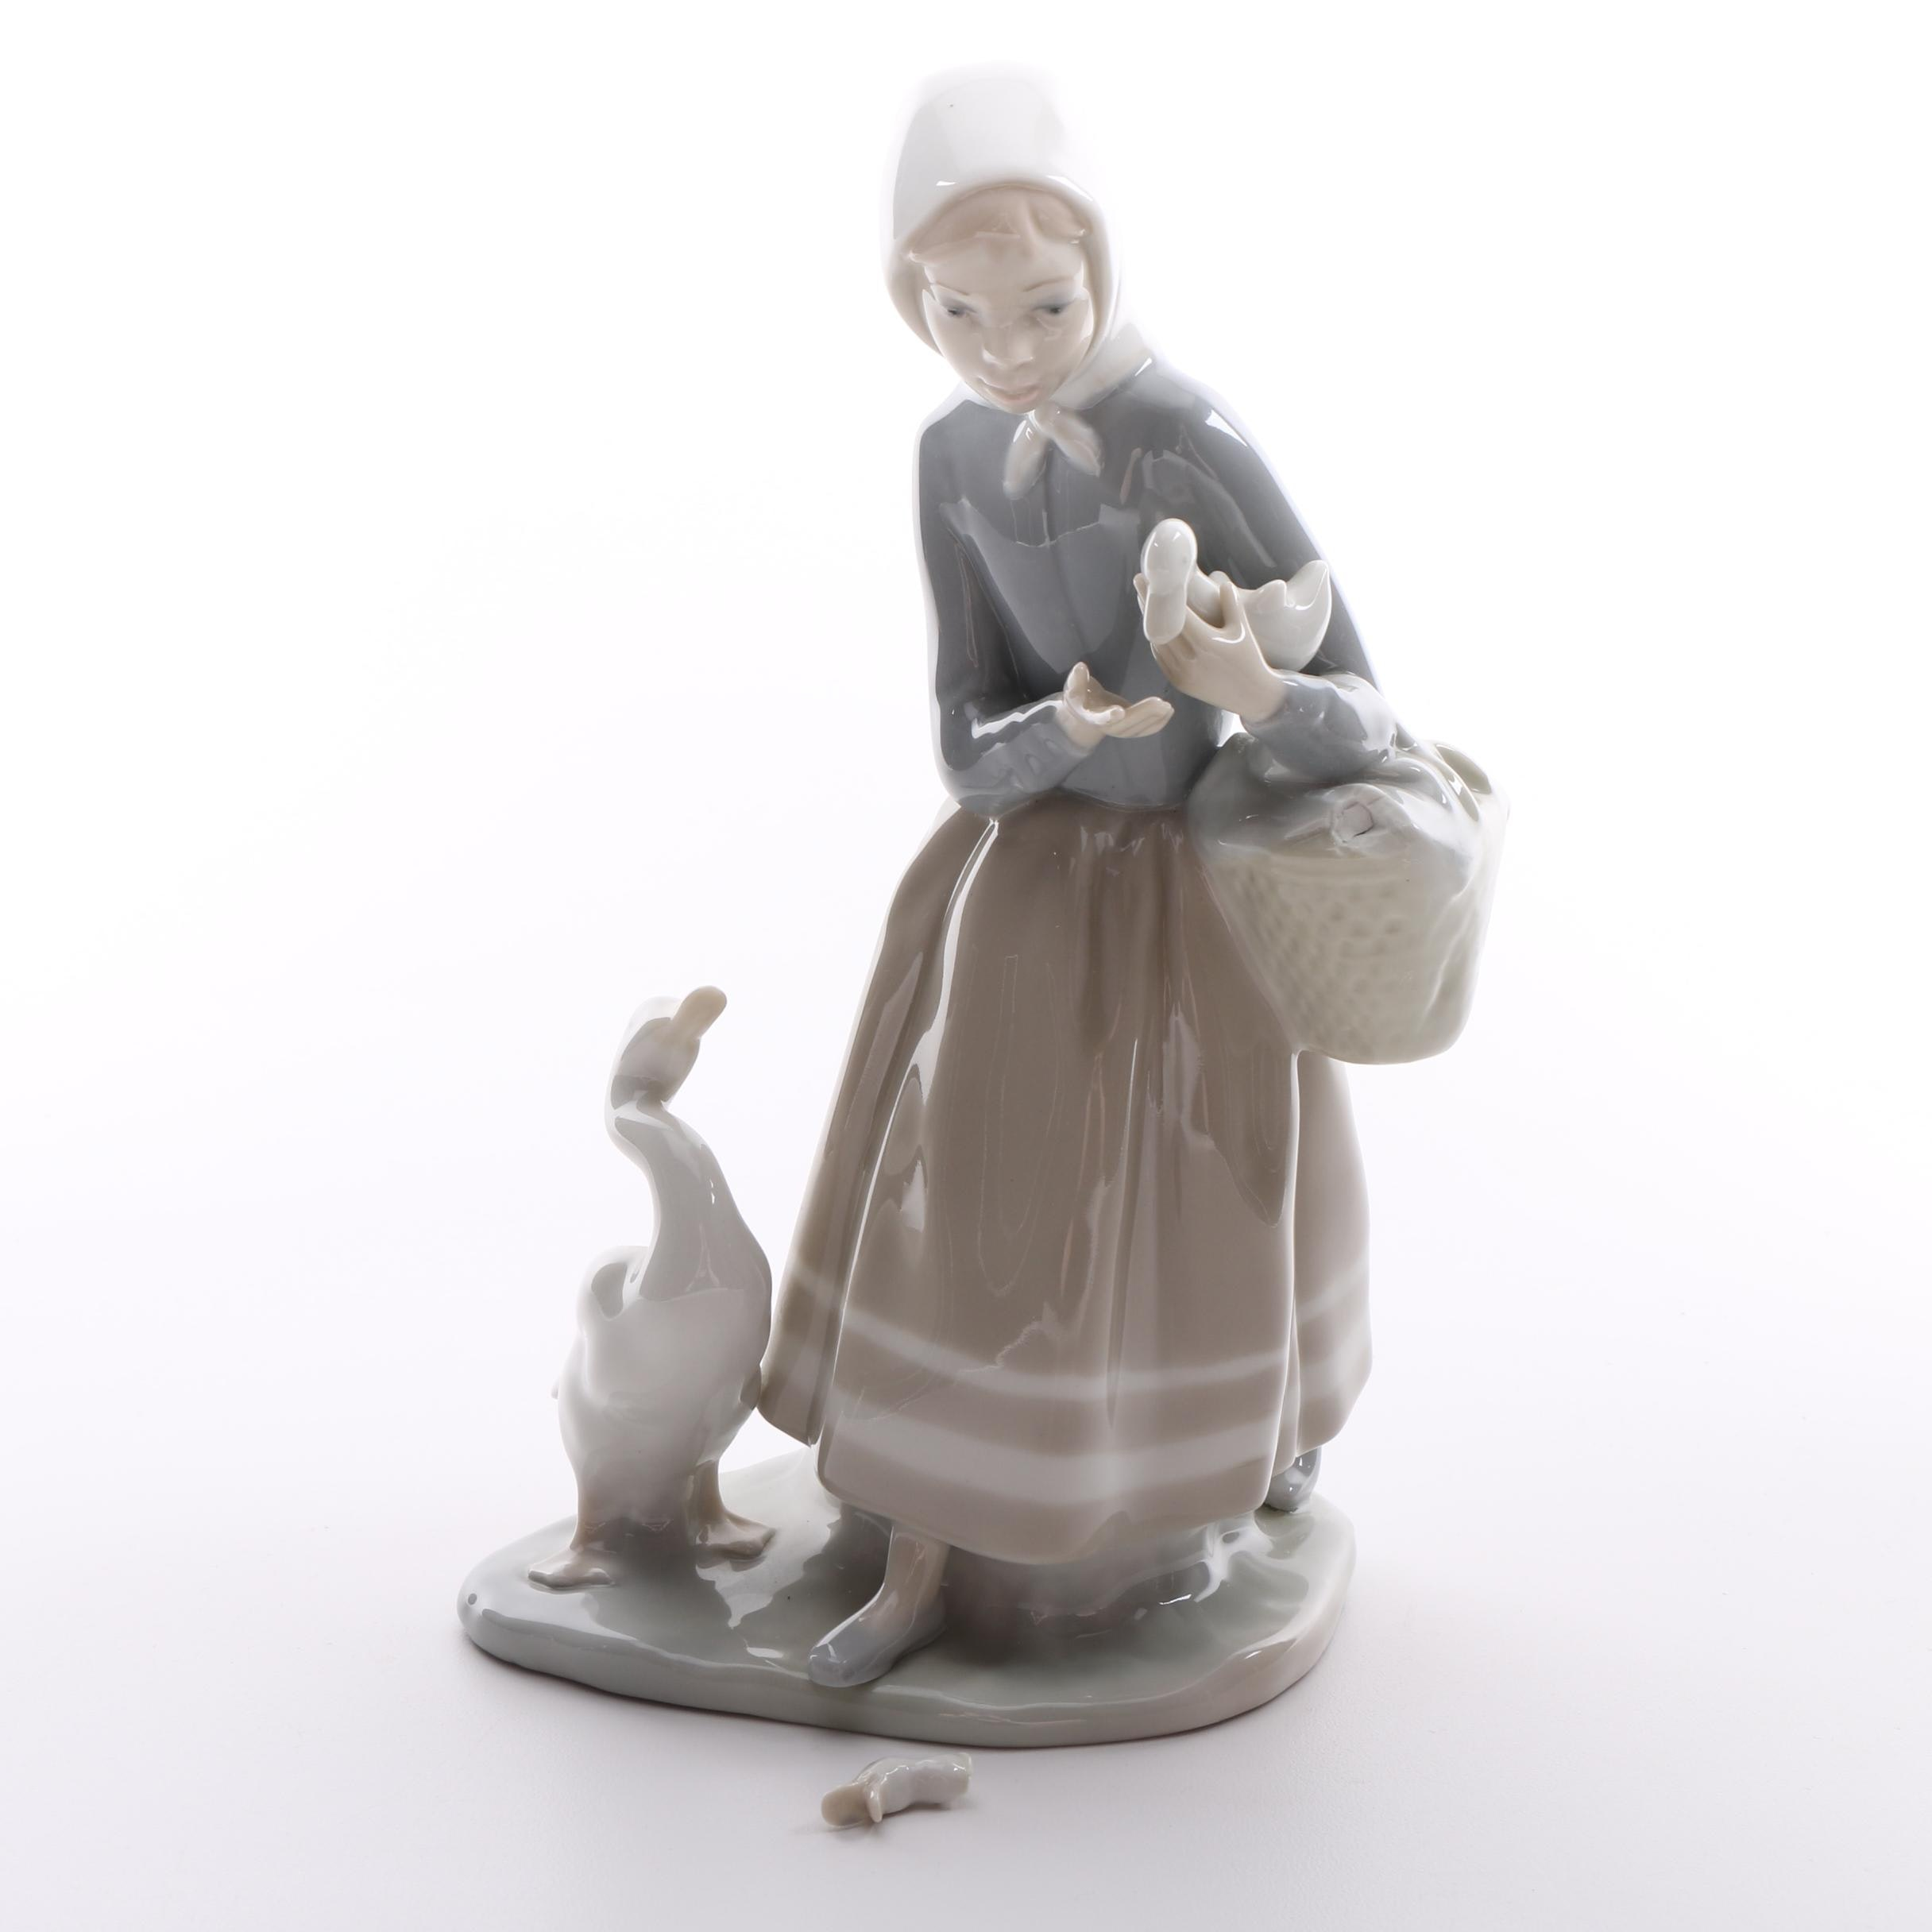 "Lladró ""Shepherdess with Ducks"" Porcelain Figurine"